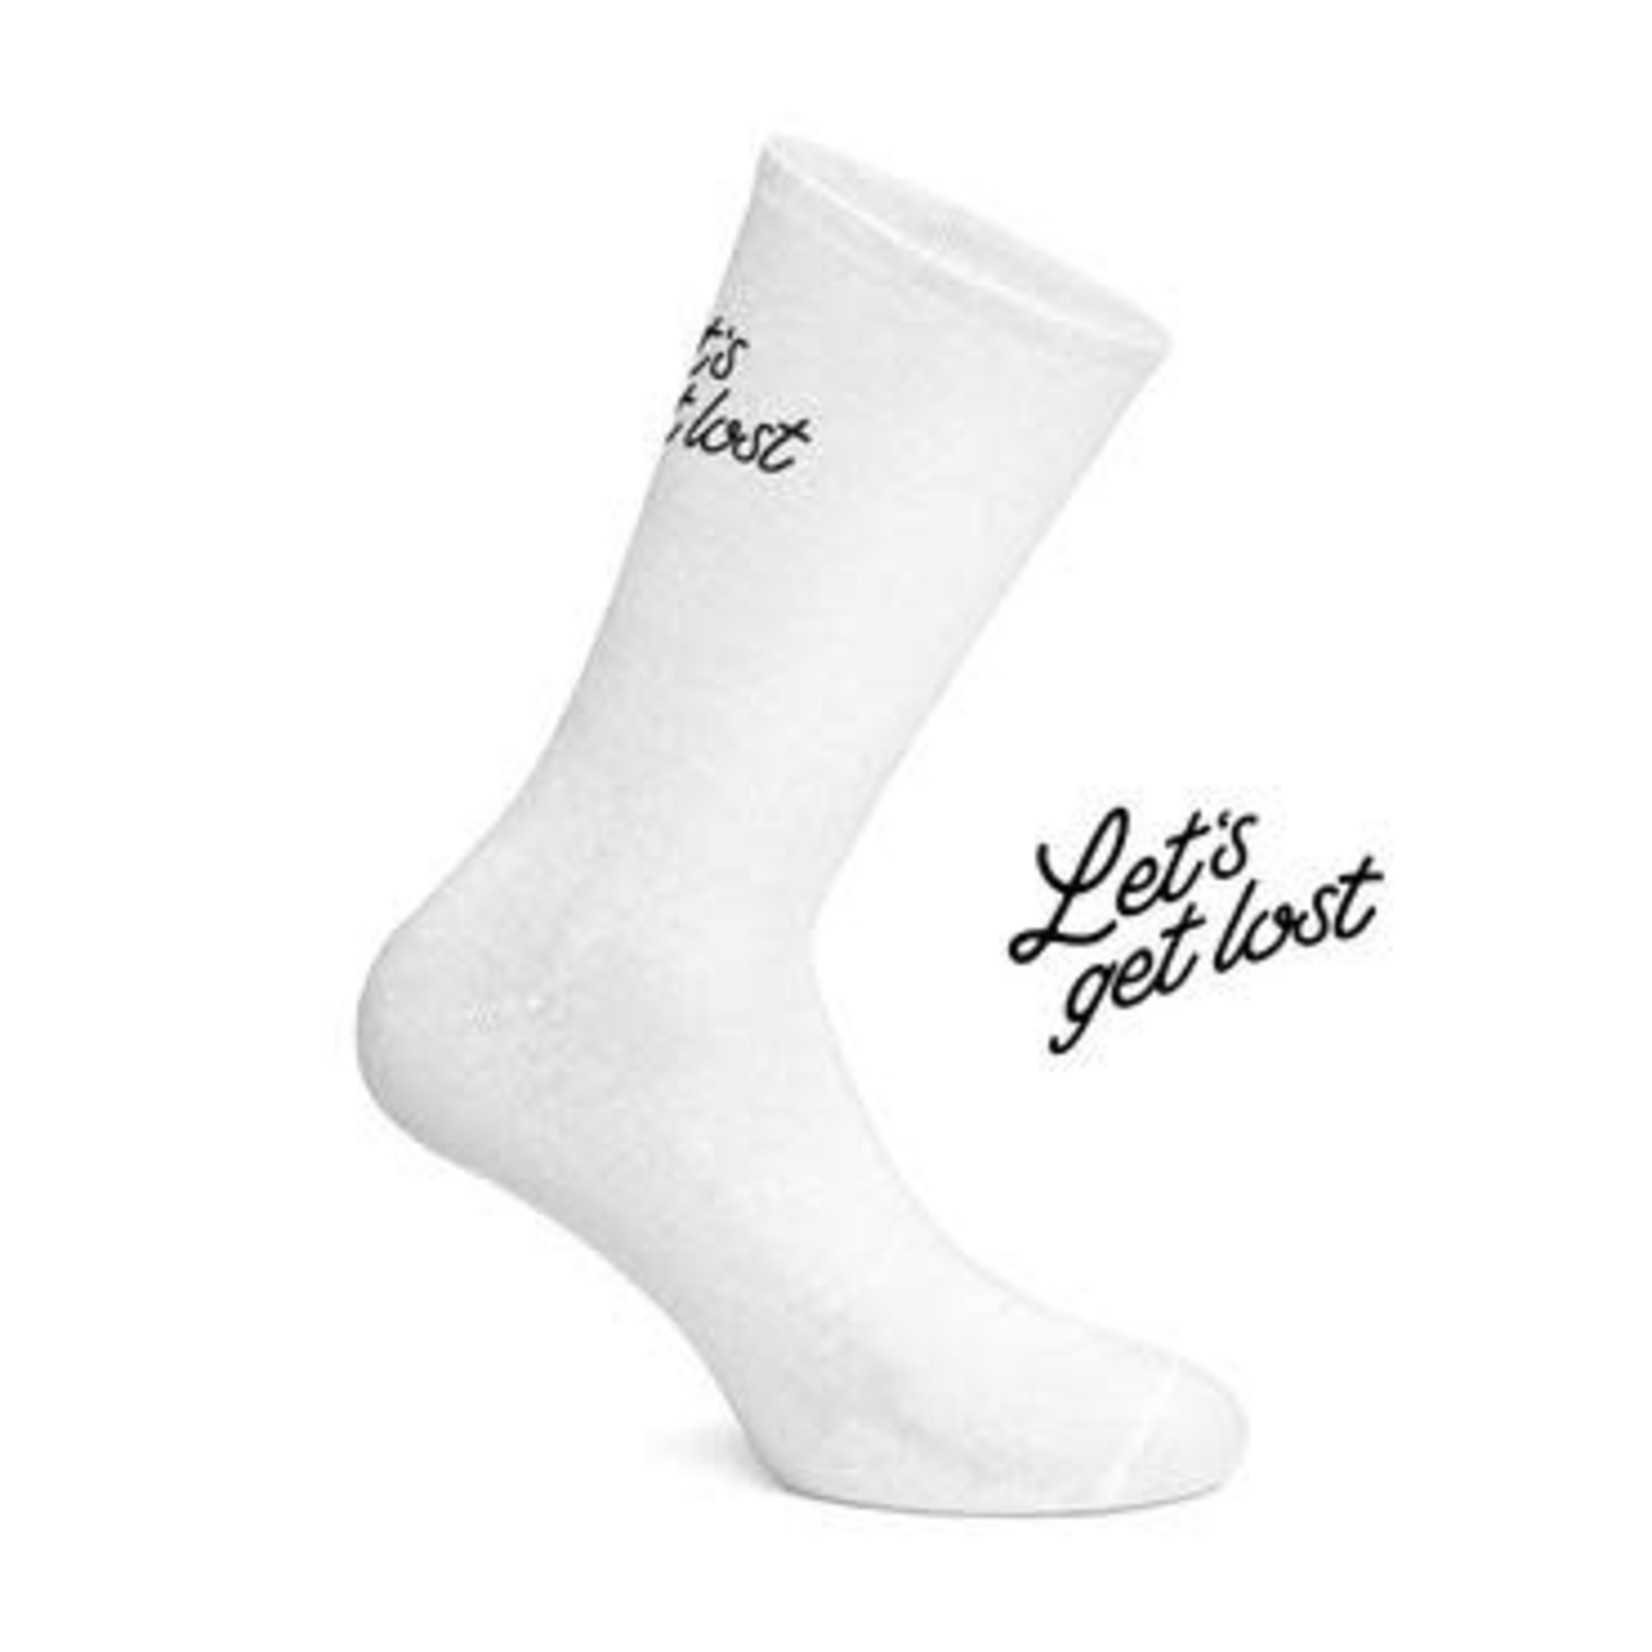 Socks- 'Let's Get Lost' white